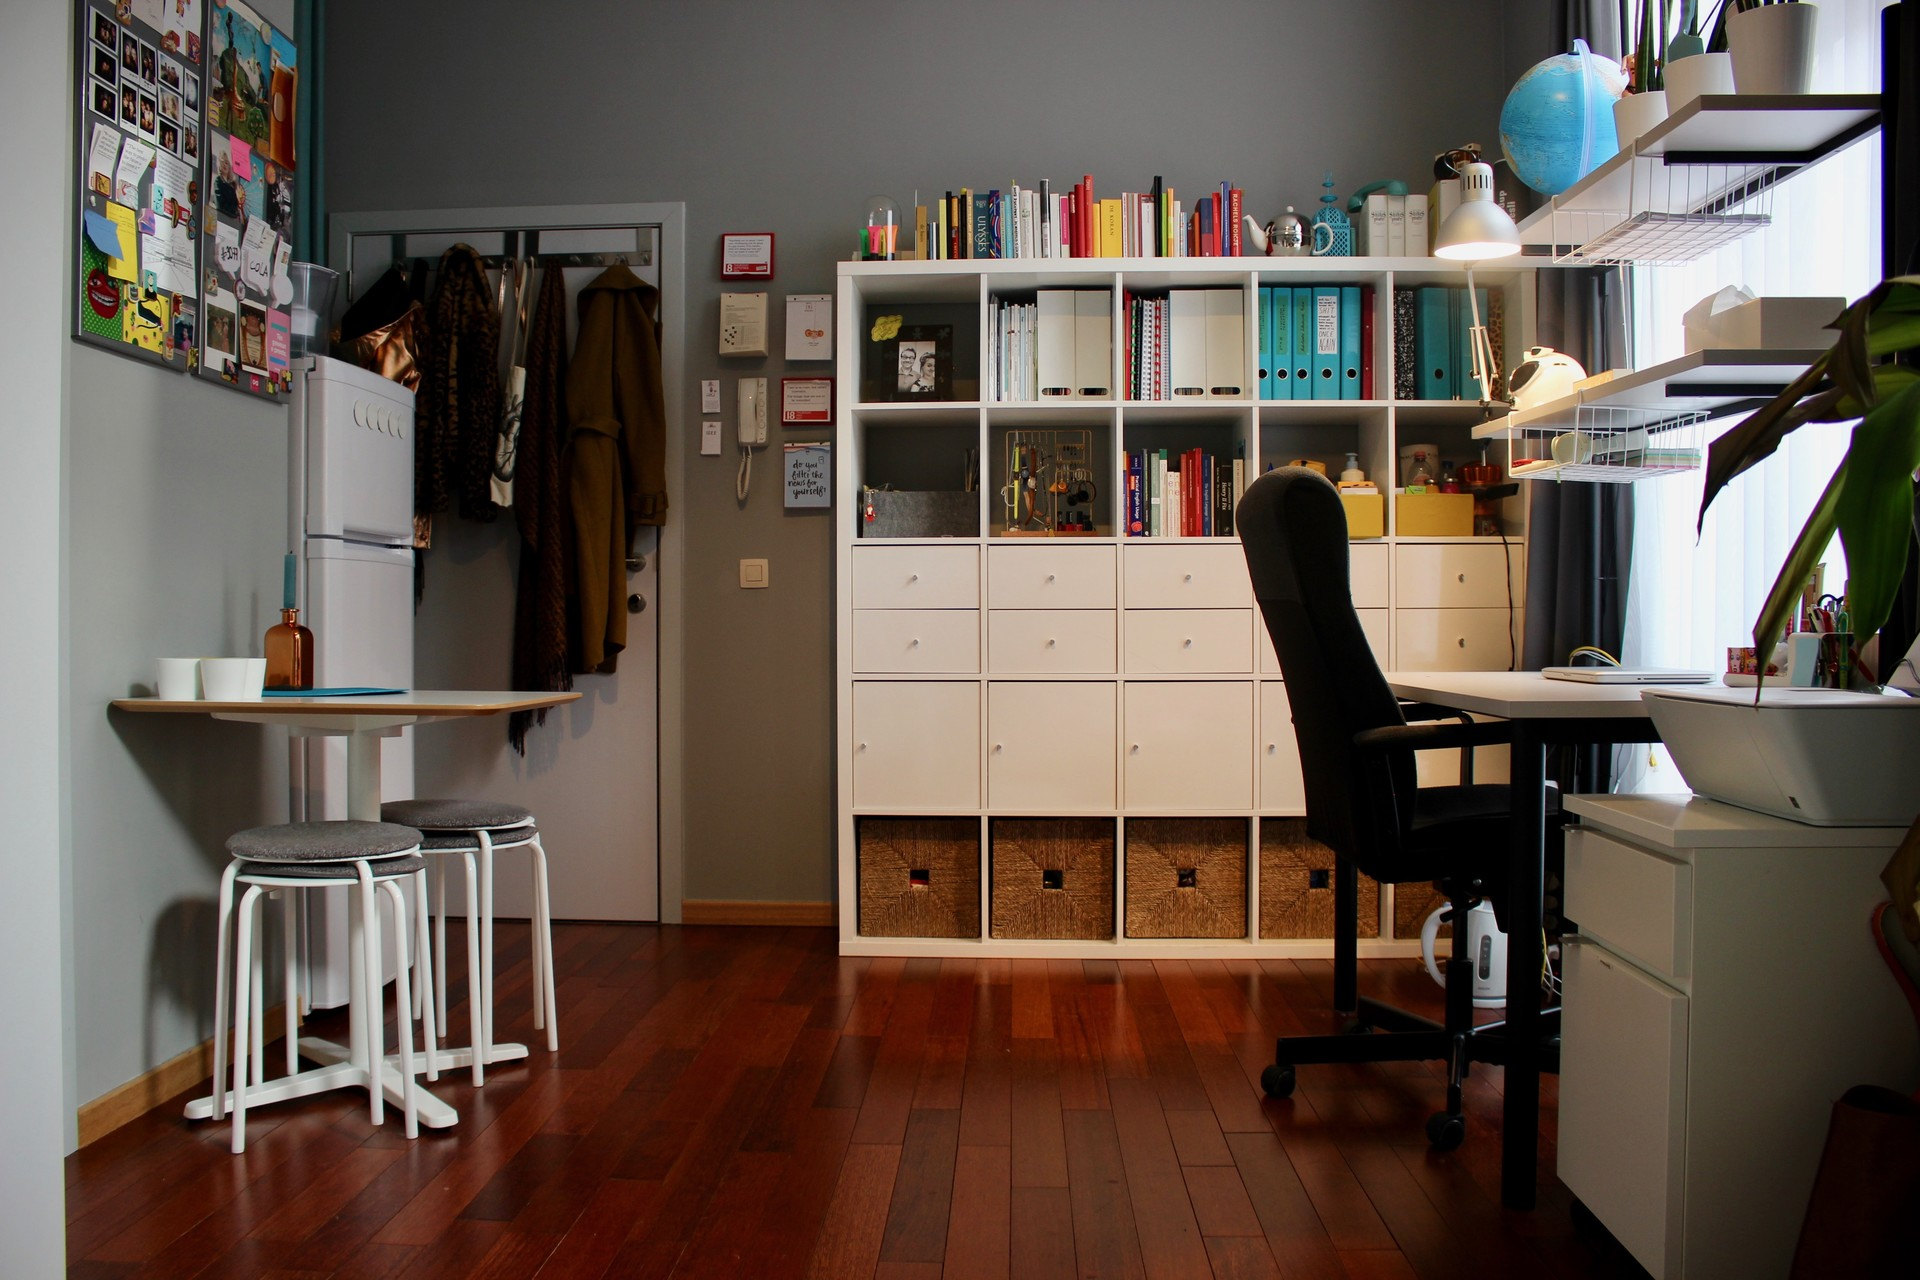 bright-spacious-studio-heart-leuven-32b66dbde108507b5e0206e5c2172d2b